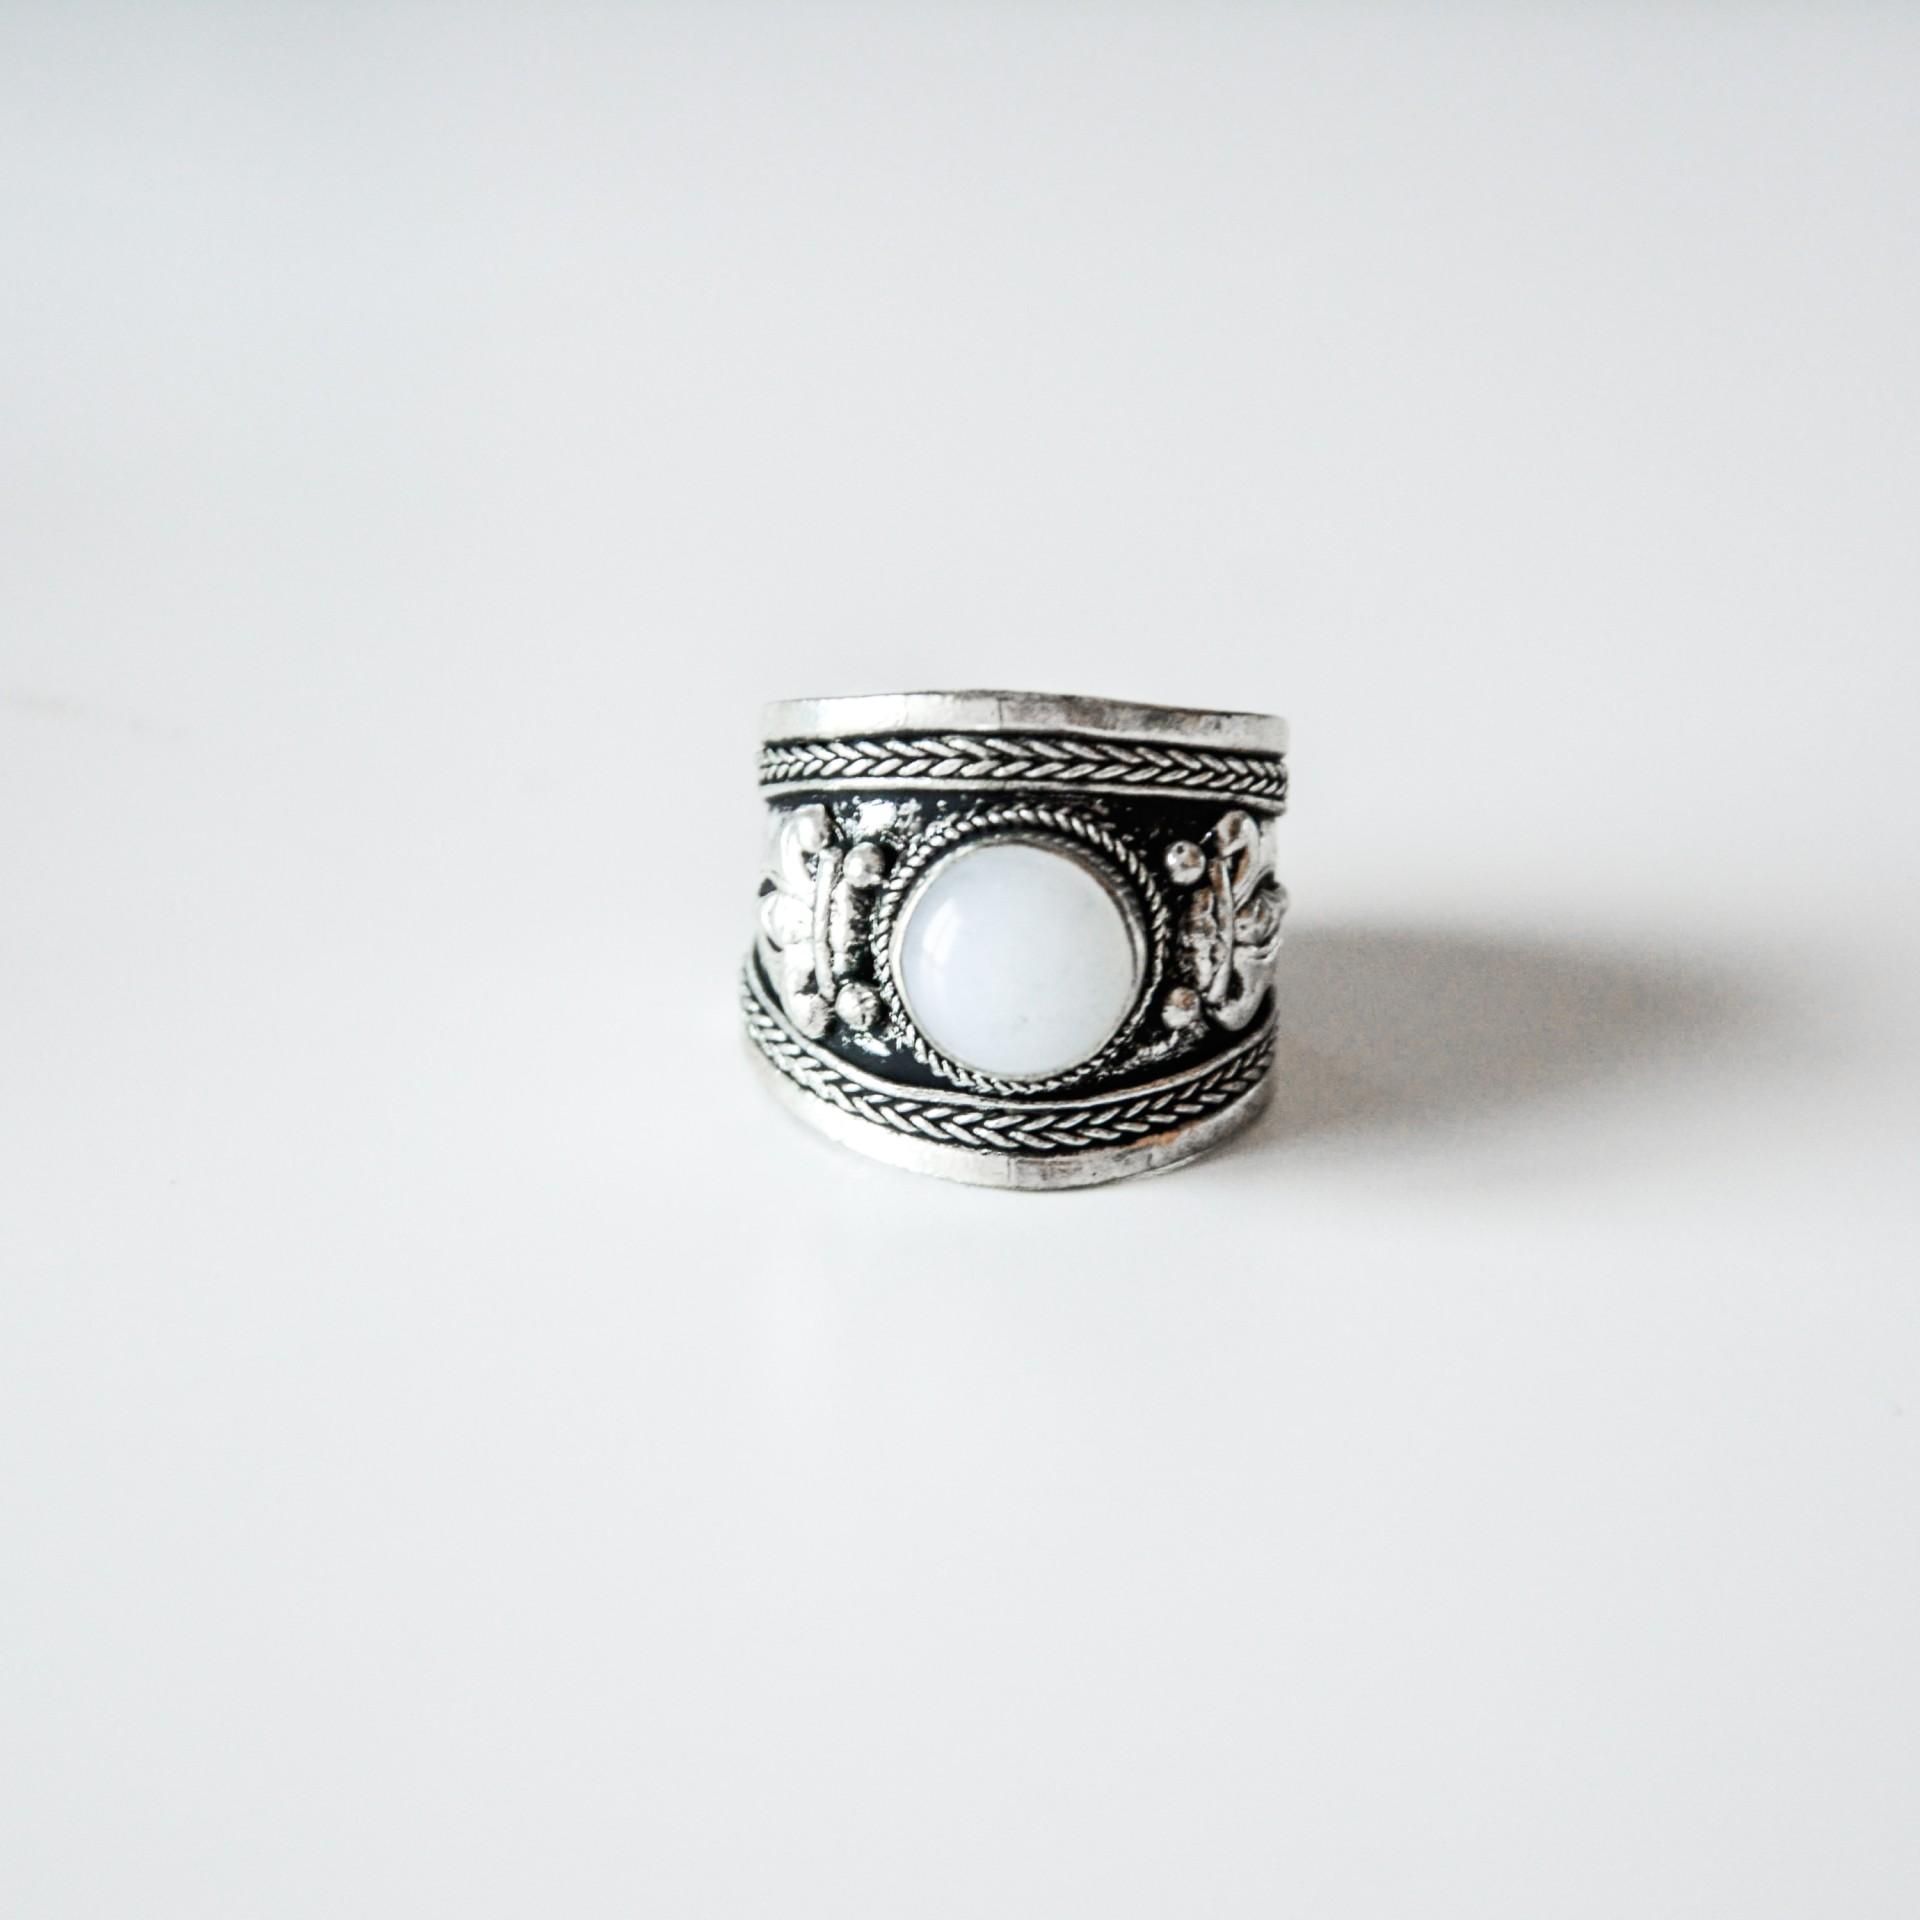 Anel em prata - Anniston